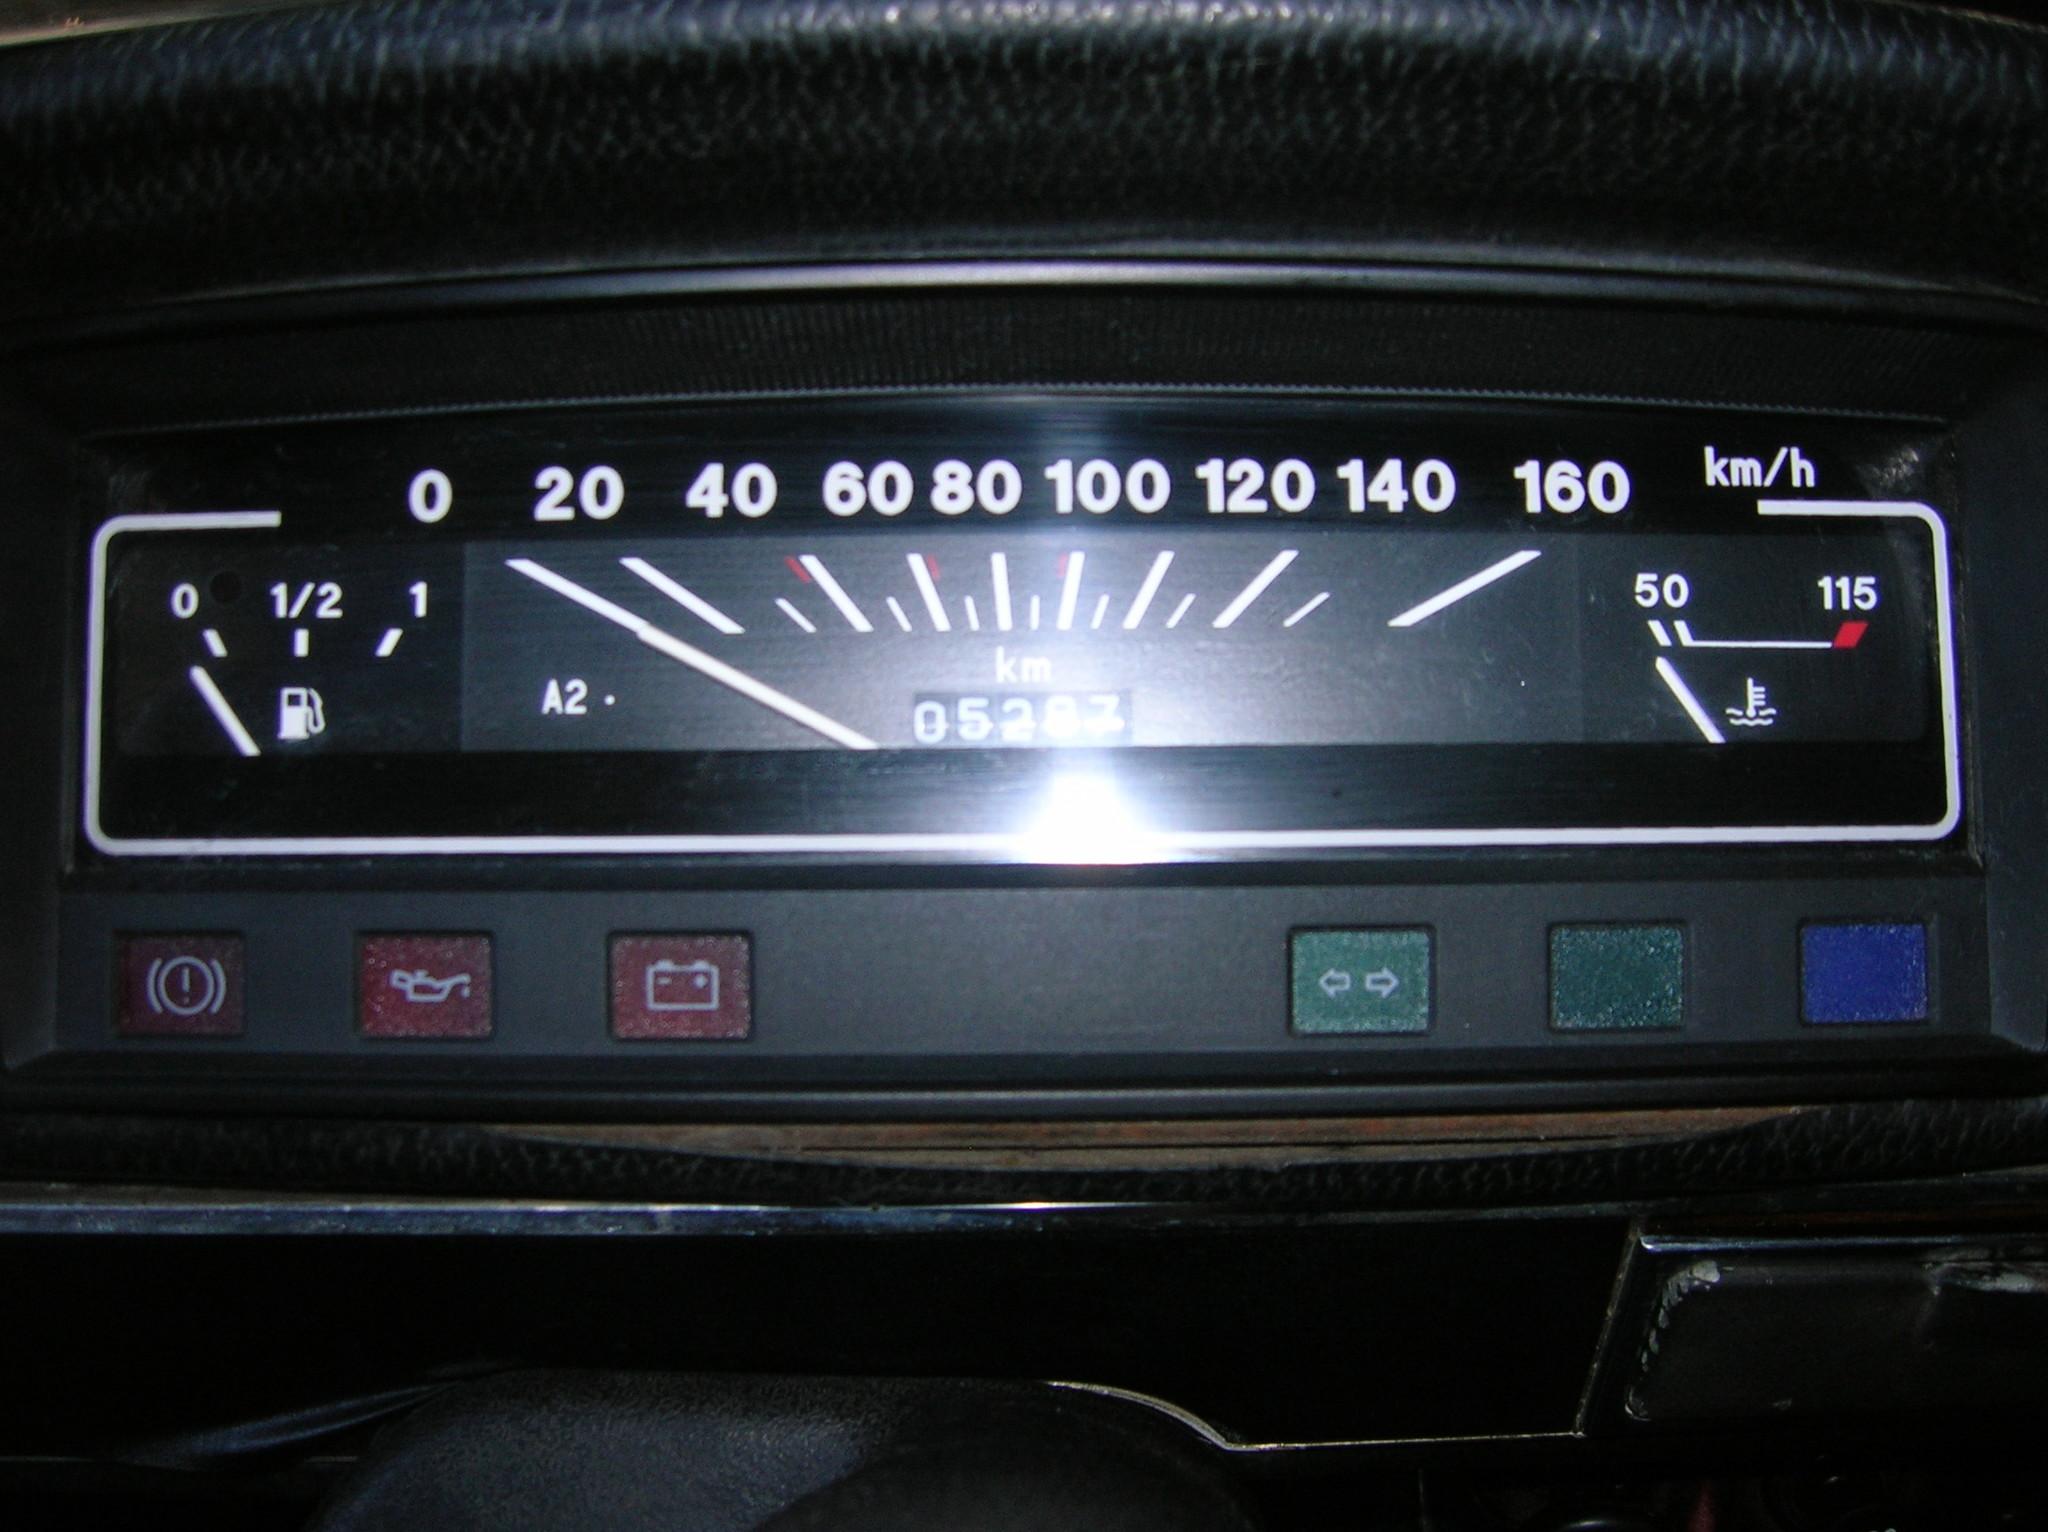 Блок питания atx12v 400-ptk схема